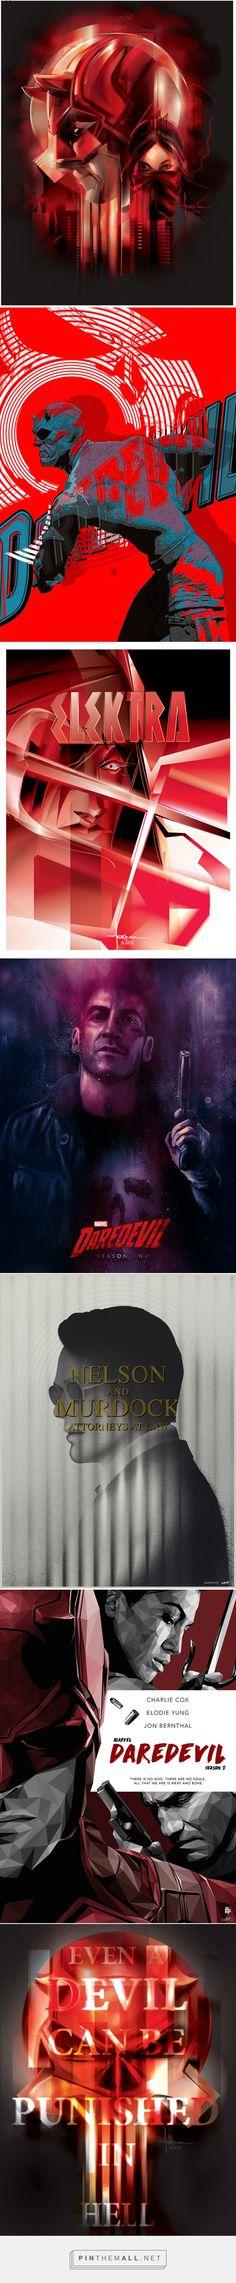 "Tribute to Netflix/ Marvel ""Daredevil: Season 2"""